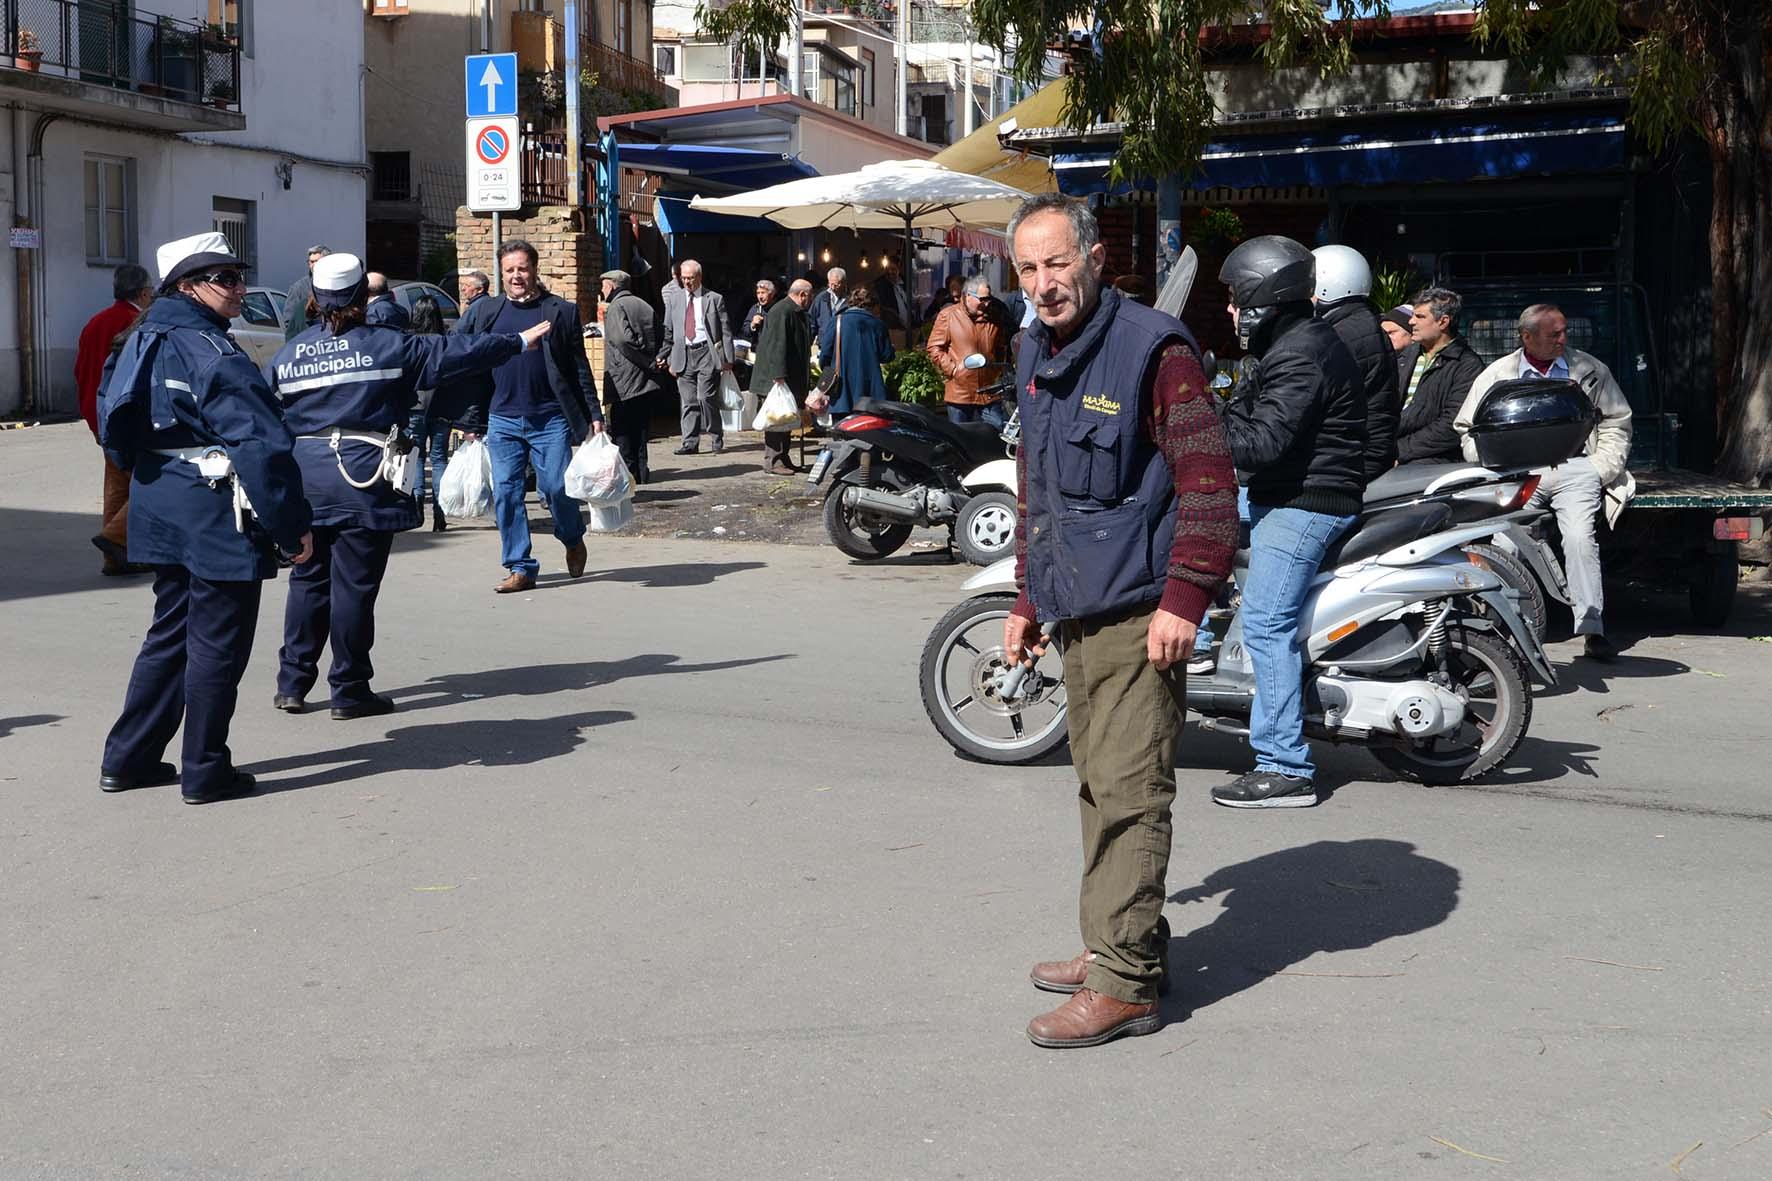 Rifiuti ingombranti e speciali, Ialacqua lancia Sos a carabinieri